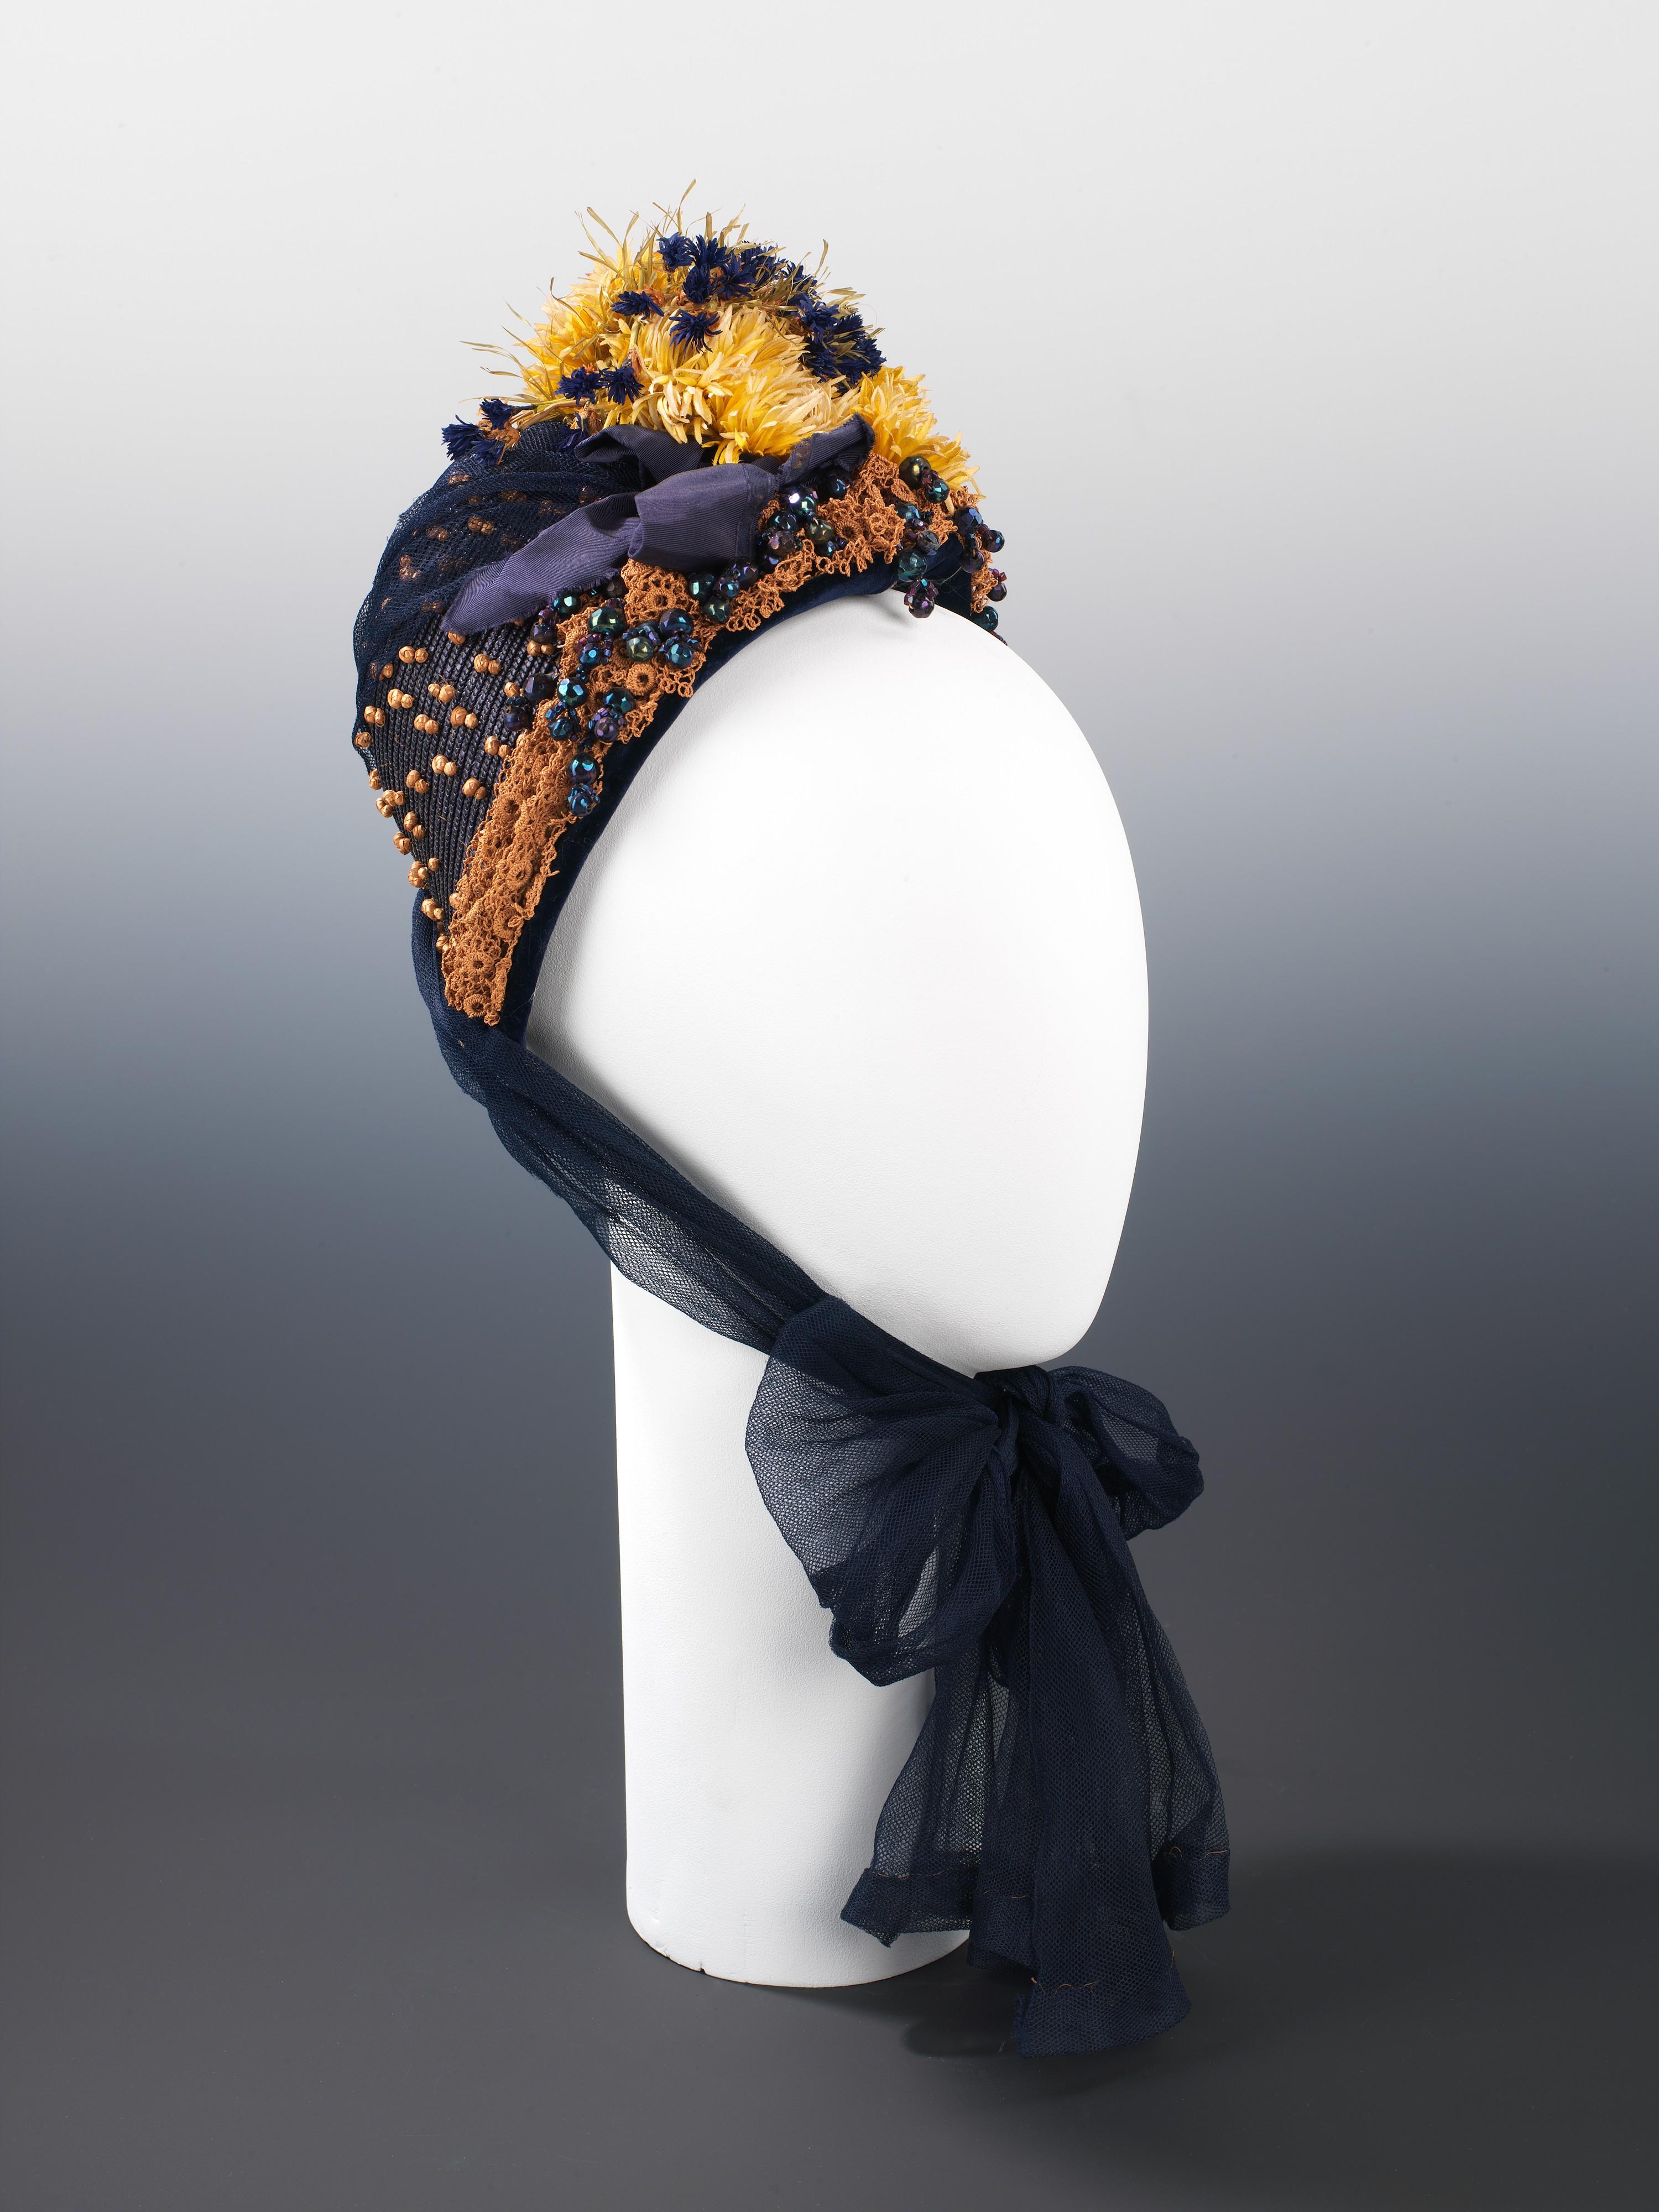 1886 aitken son company straw and silk bonnet via met museum